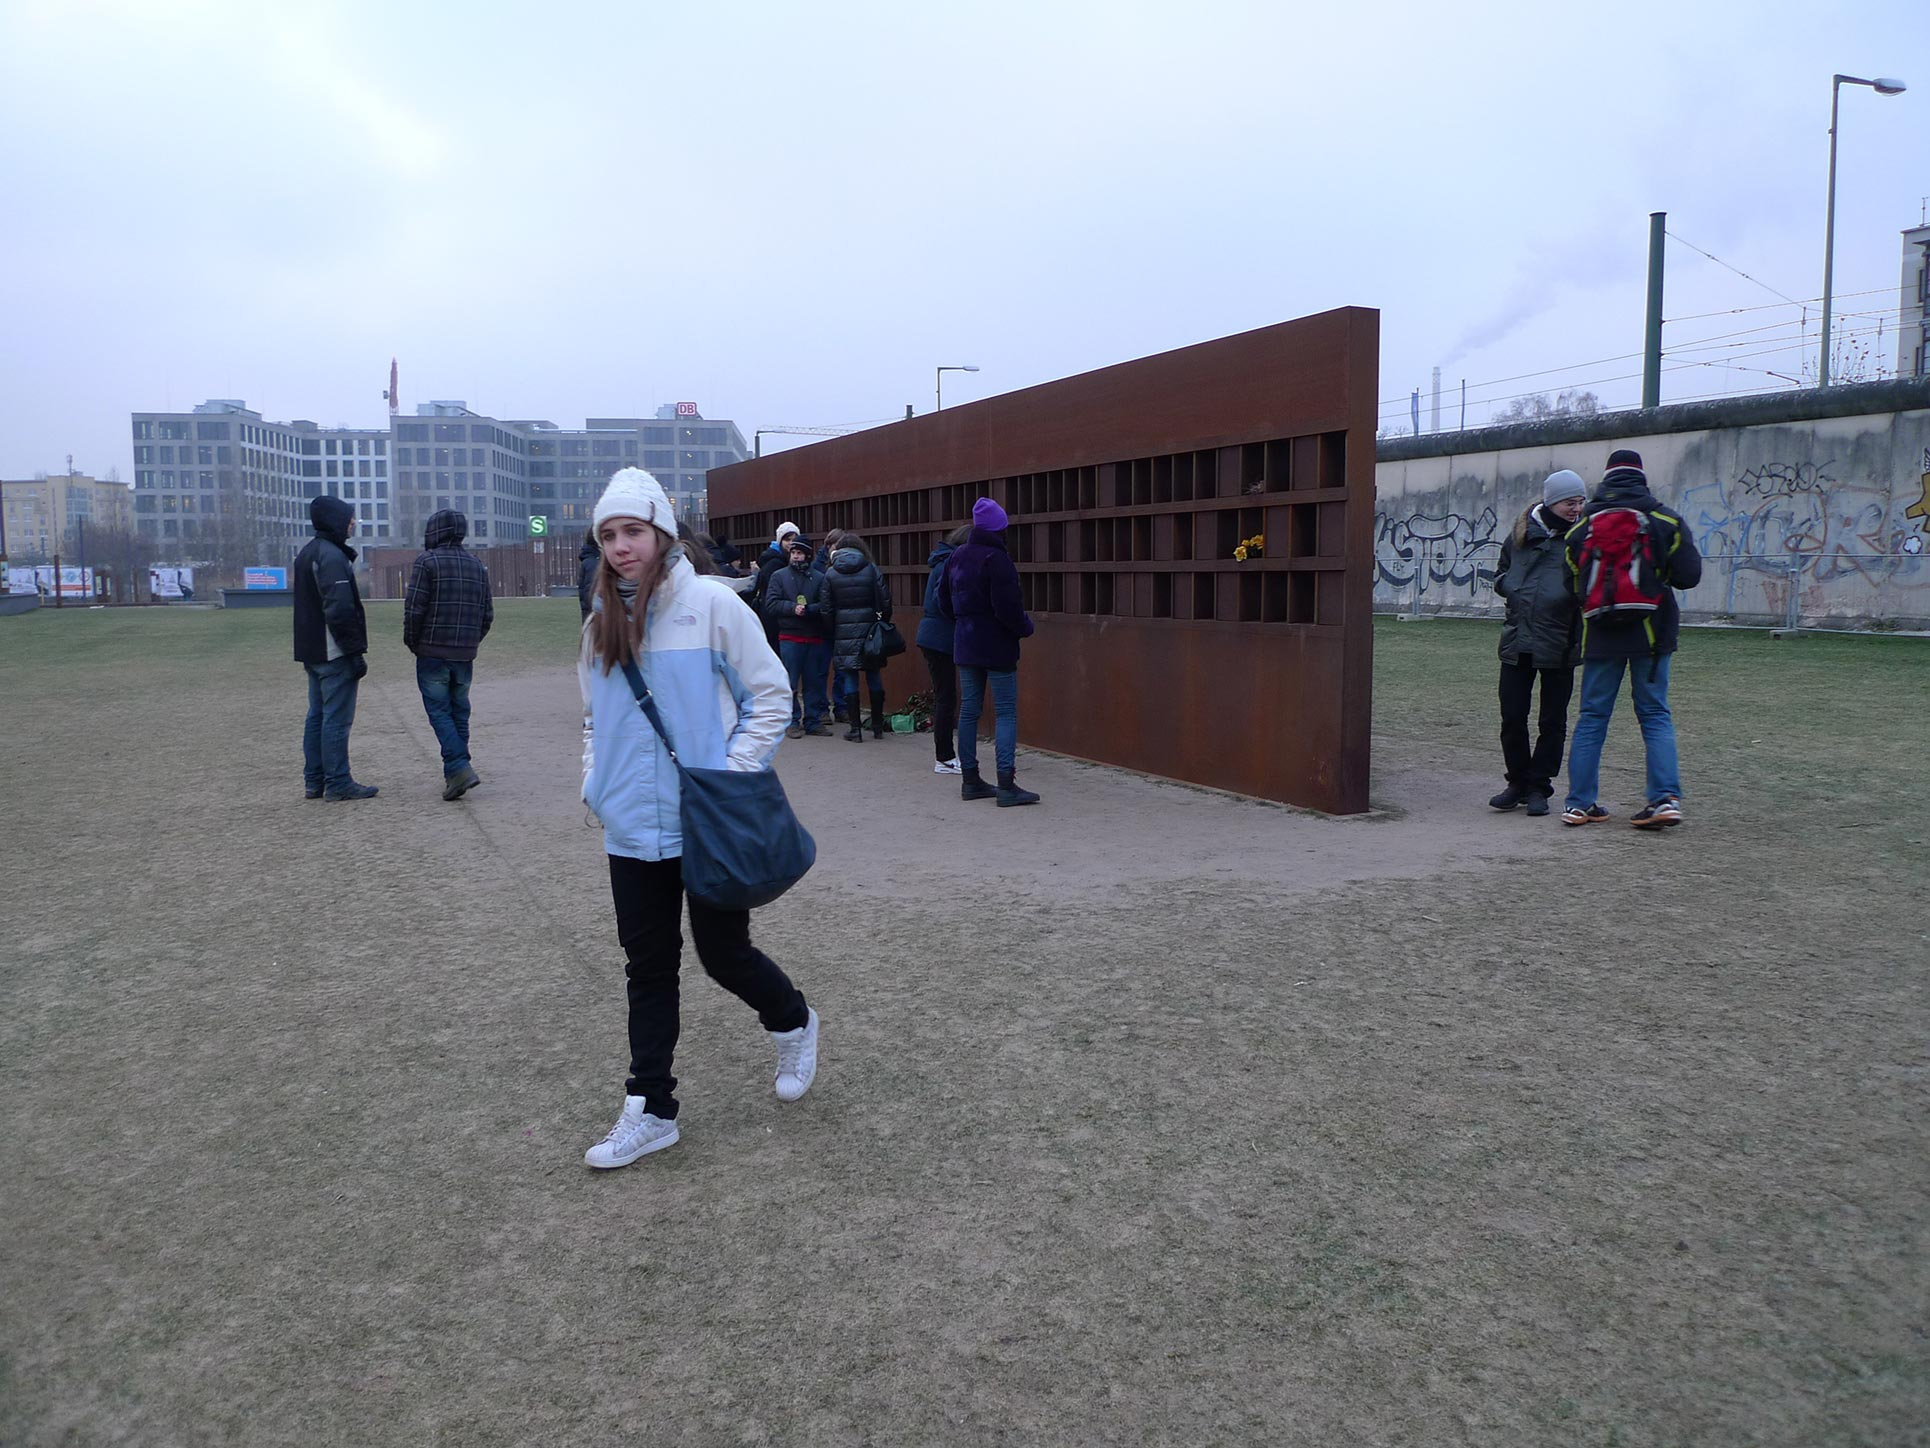 The Wall Memorial at Bernauer Strasse in Berlin Mitte (Photo: Barbara Fässler)